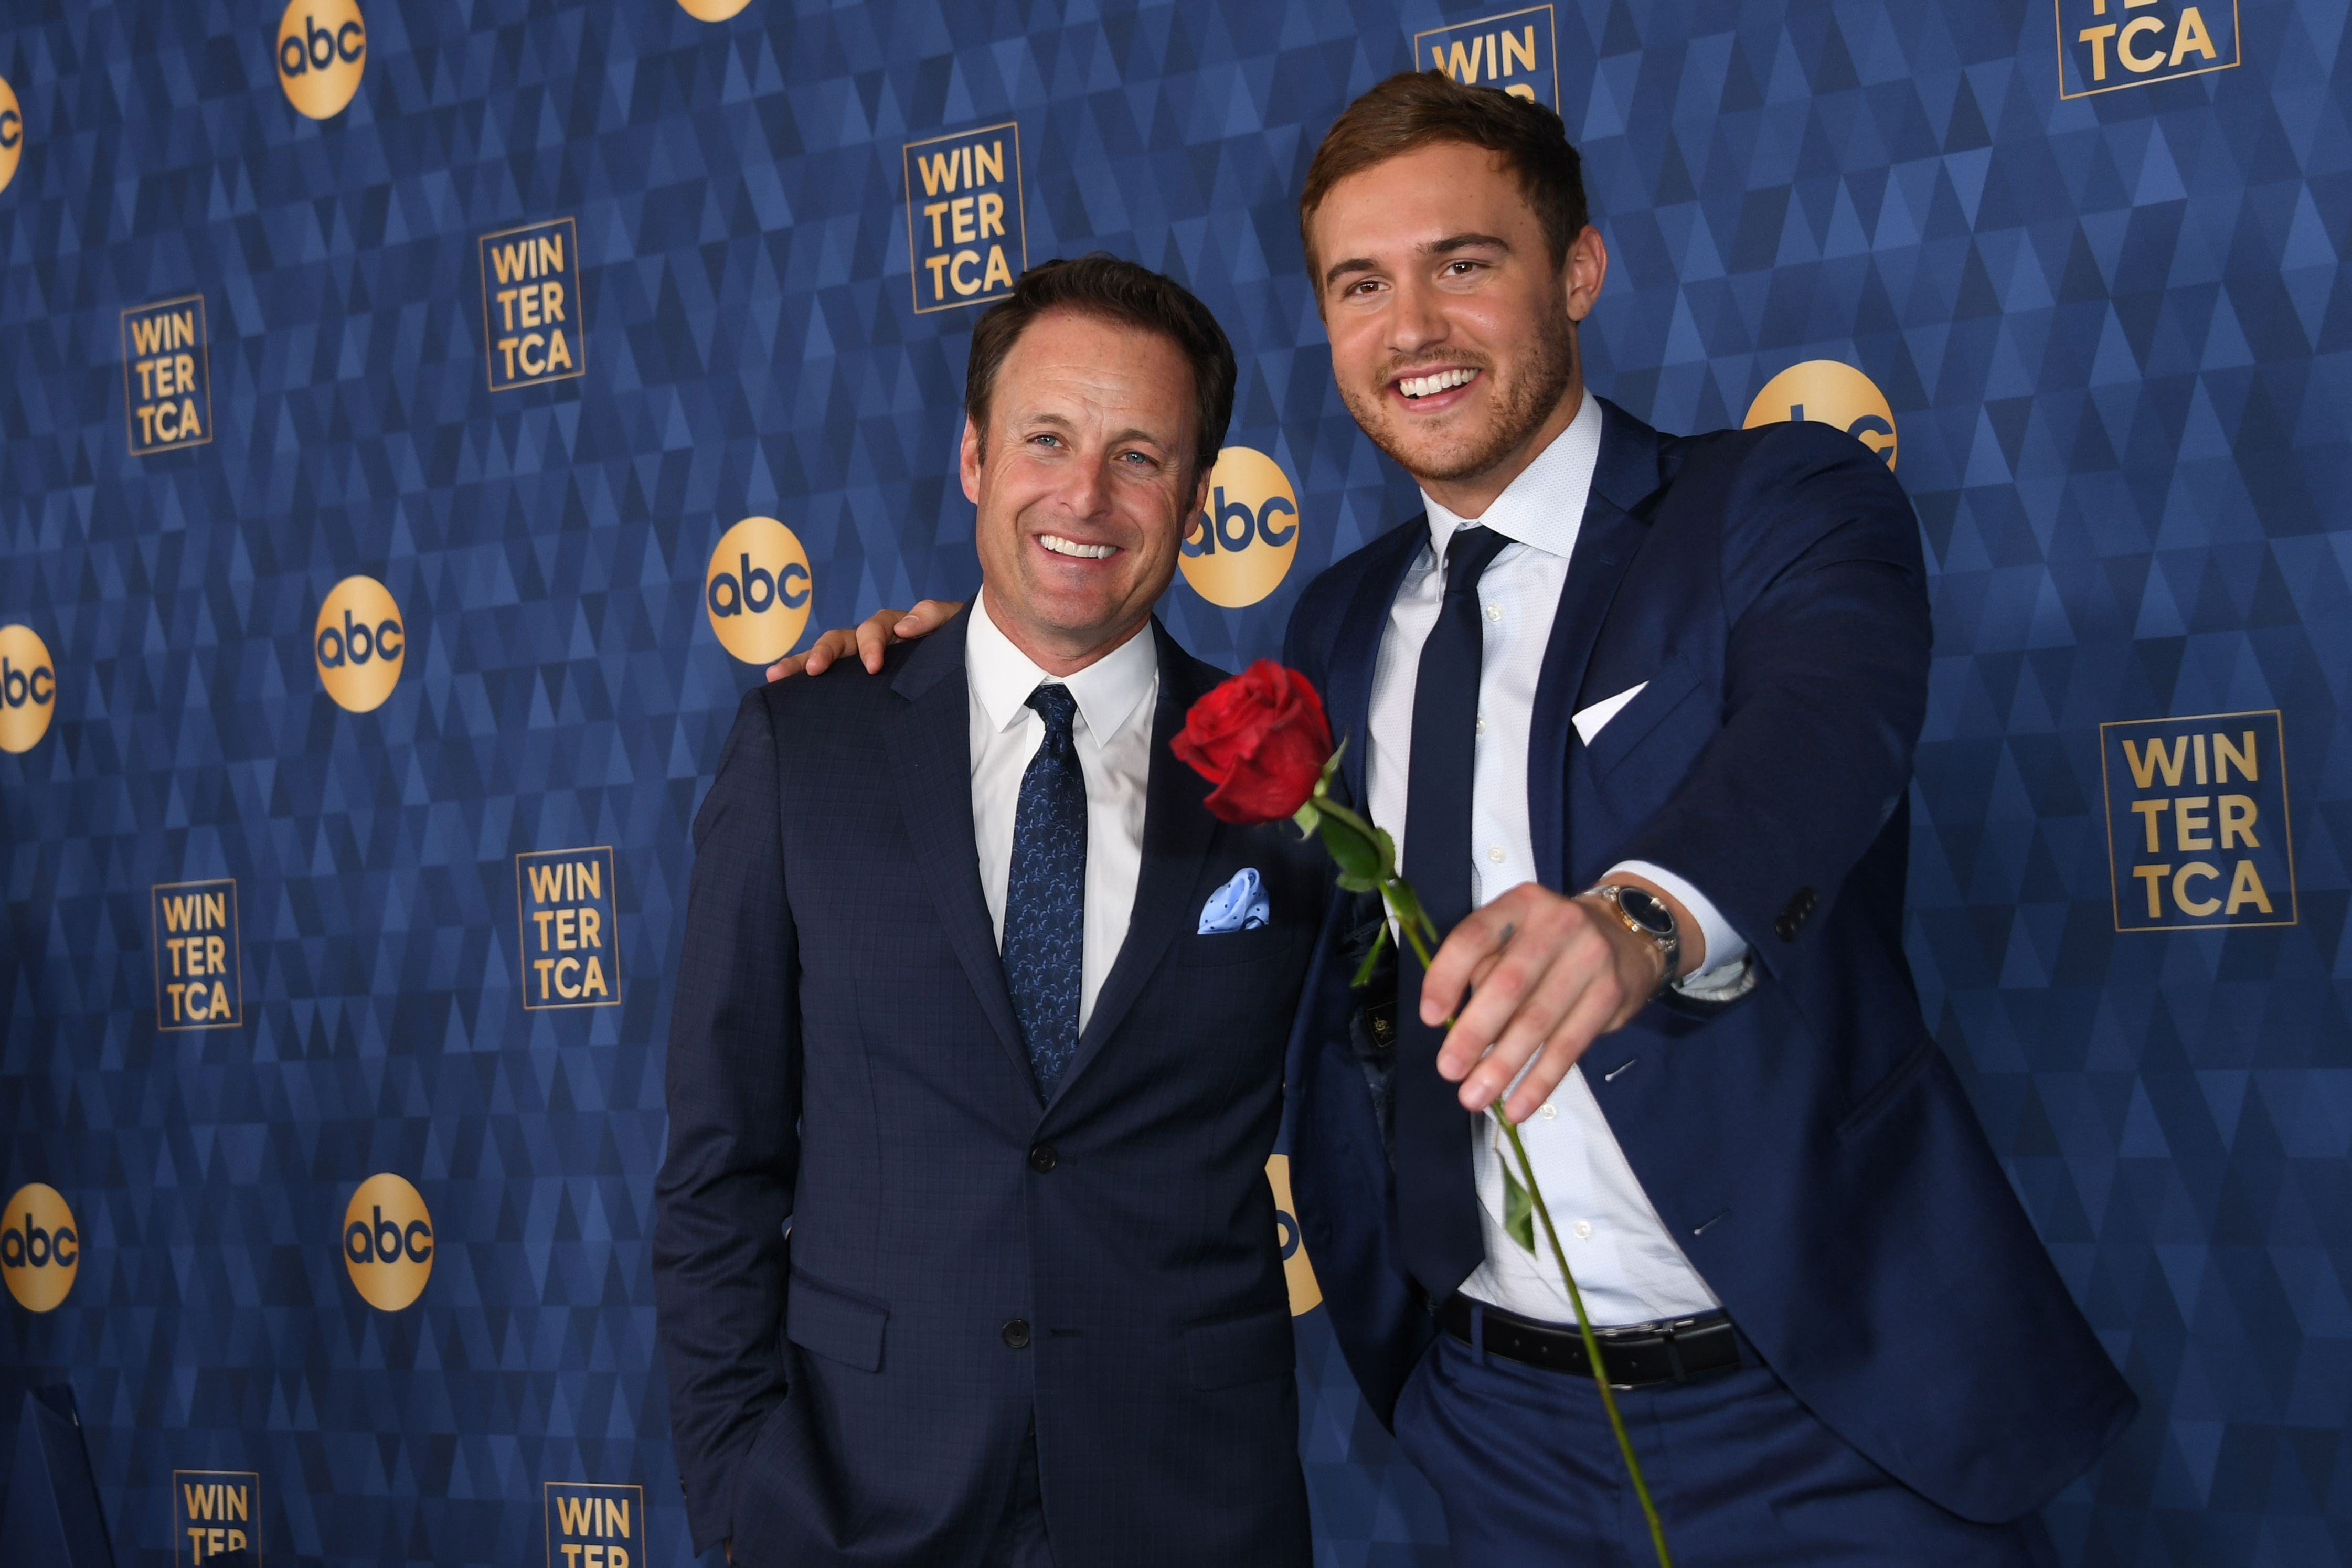 'Bachelor' host Chris Harrison and current lead Peter Weber